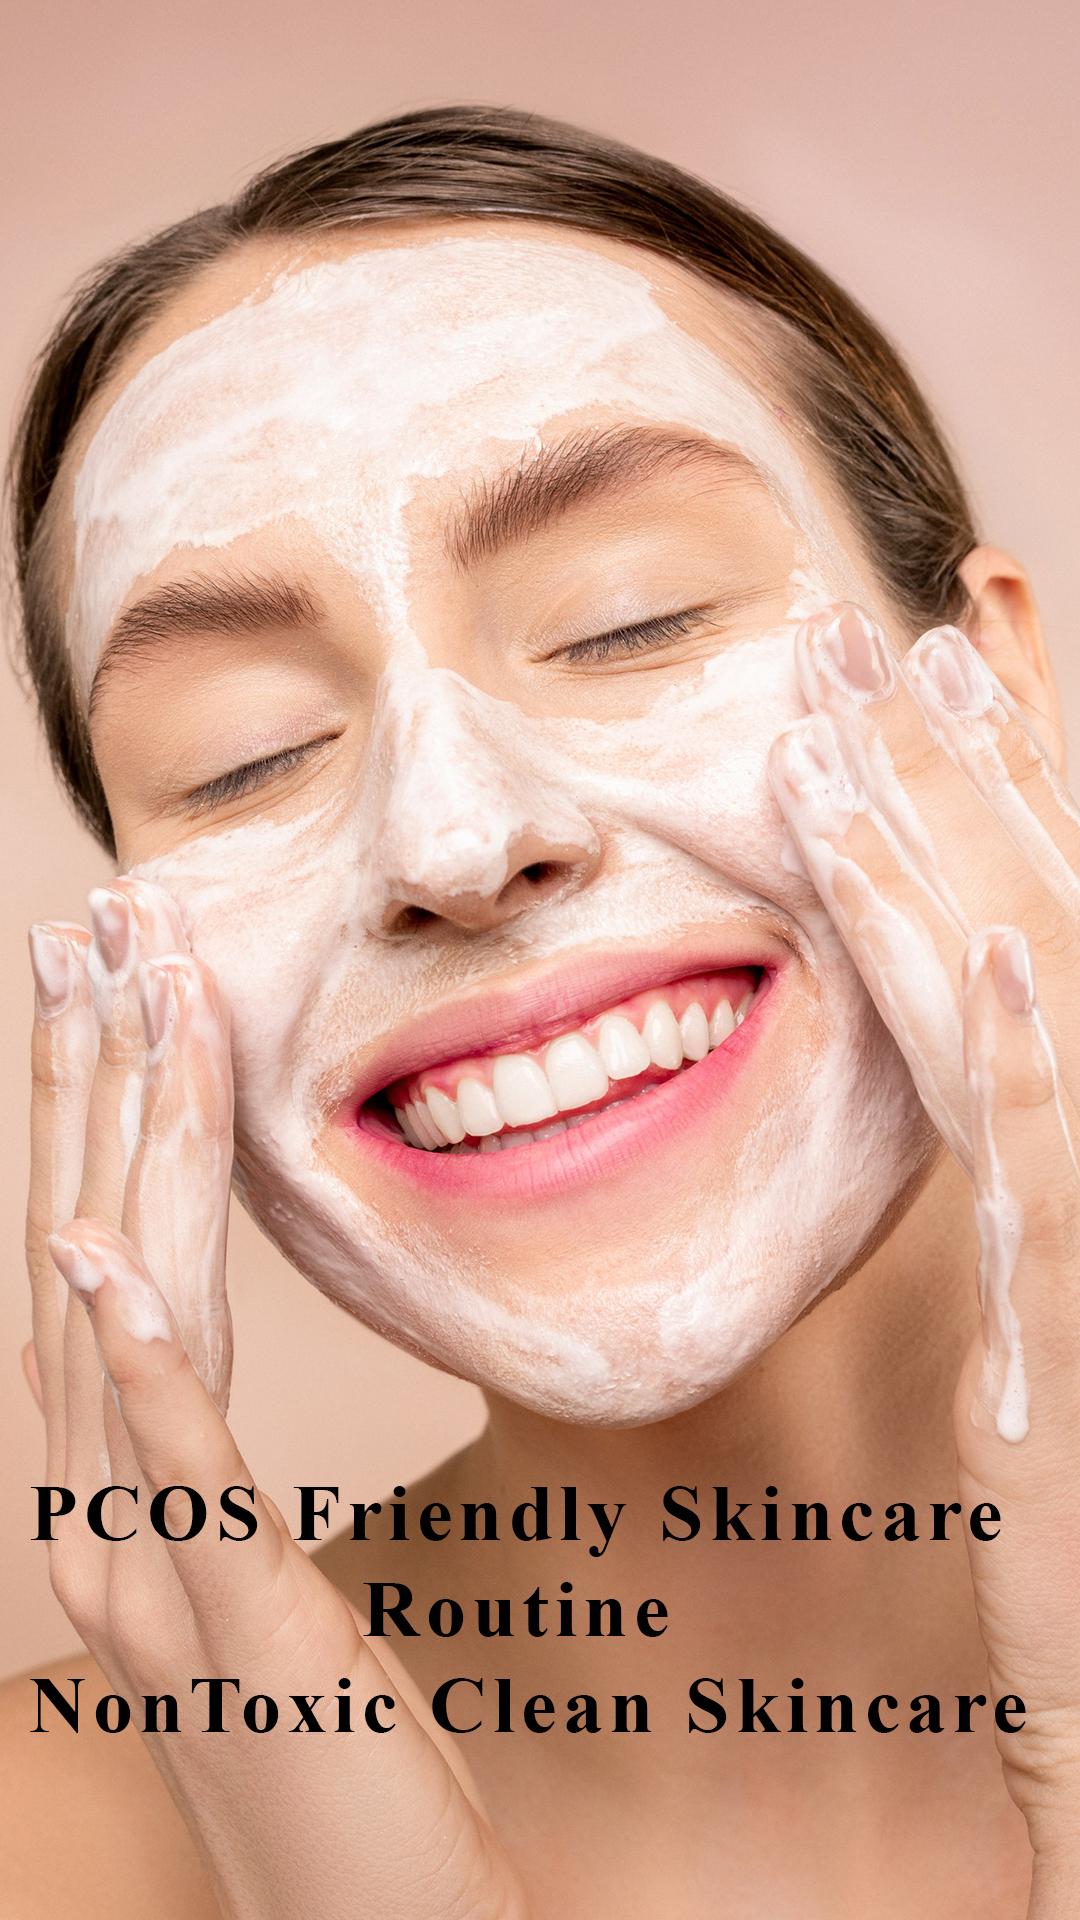 PCOS Friendly Skincare Routine – NonToxic Clean Skincare